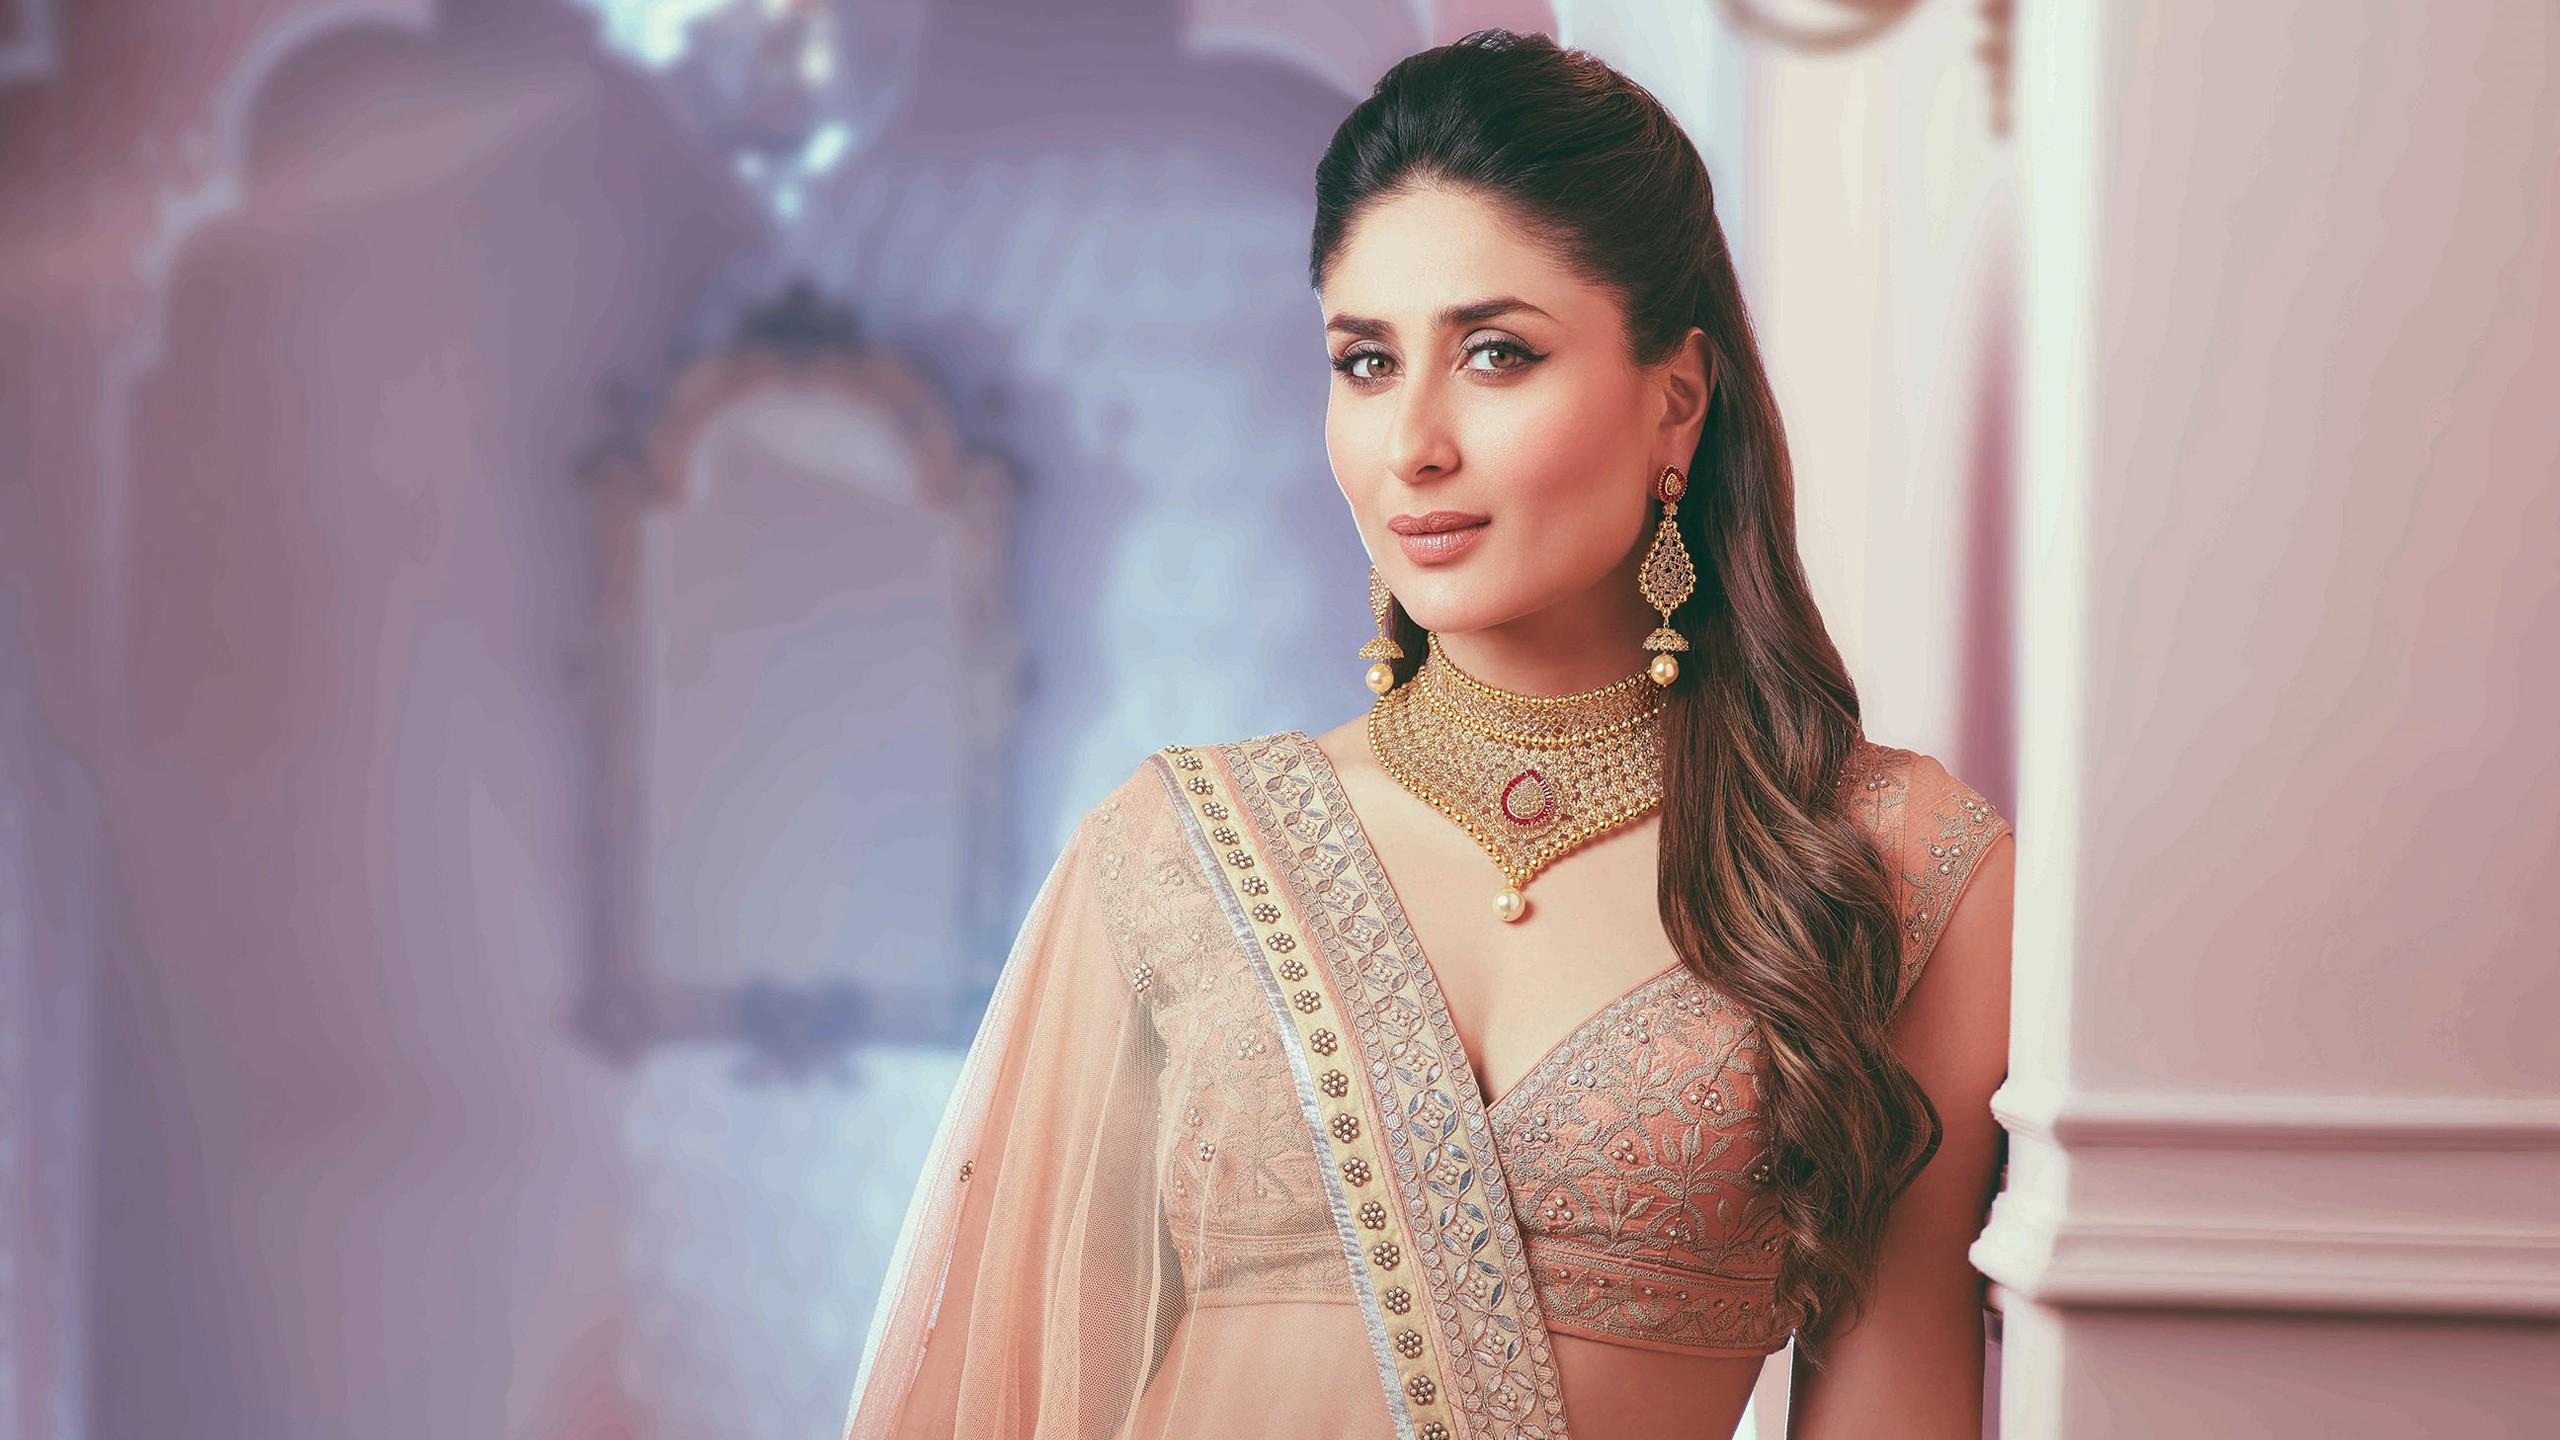 Kareena Kapoor HD 2016 Wallpapers HD Wallpapers ID 18823